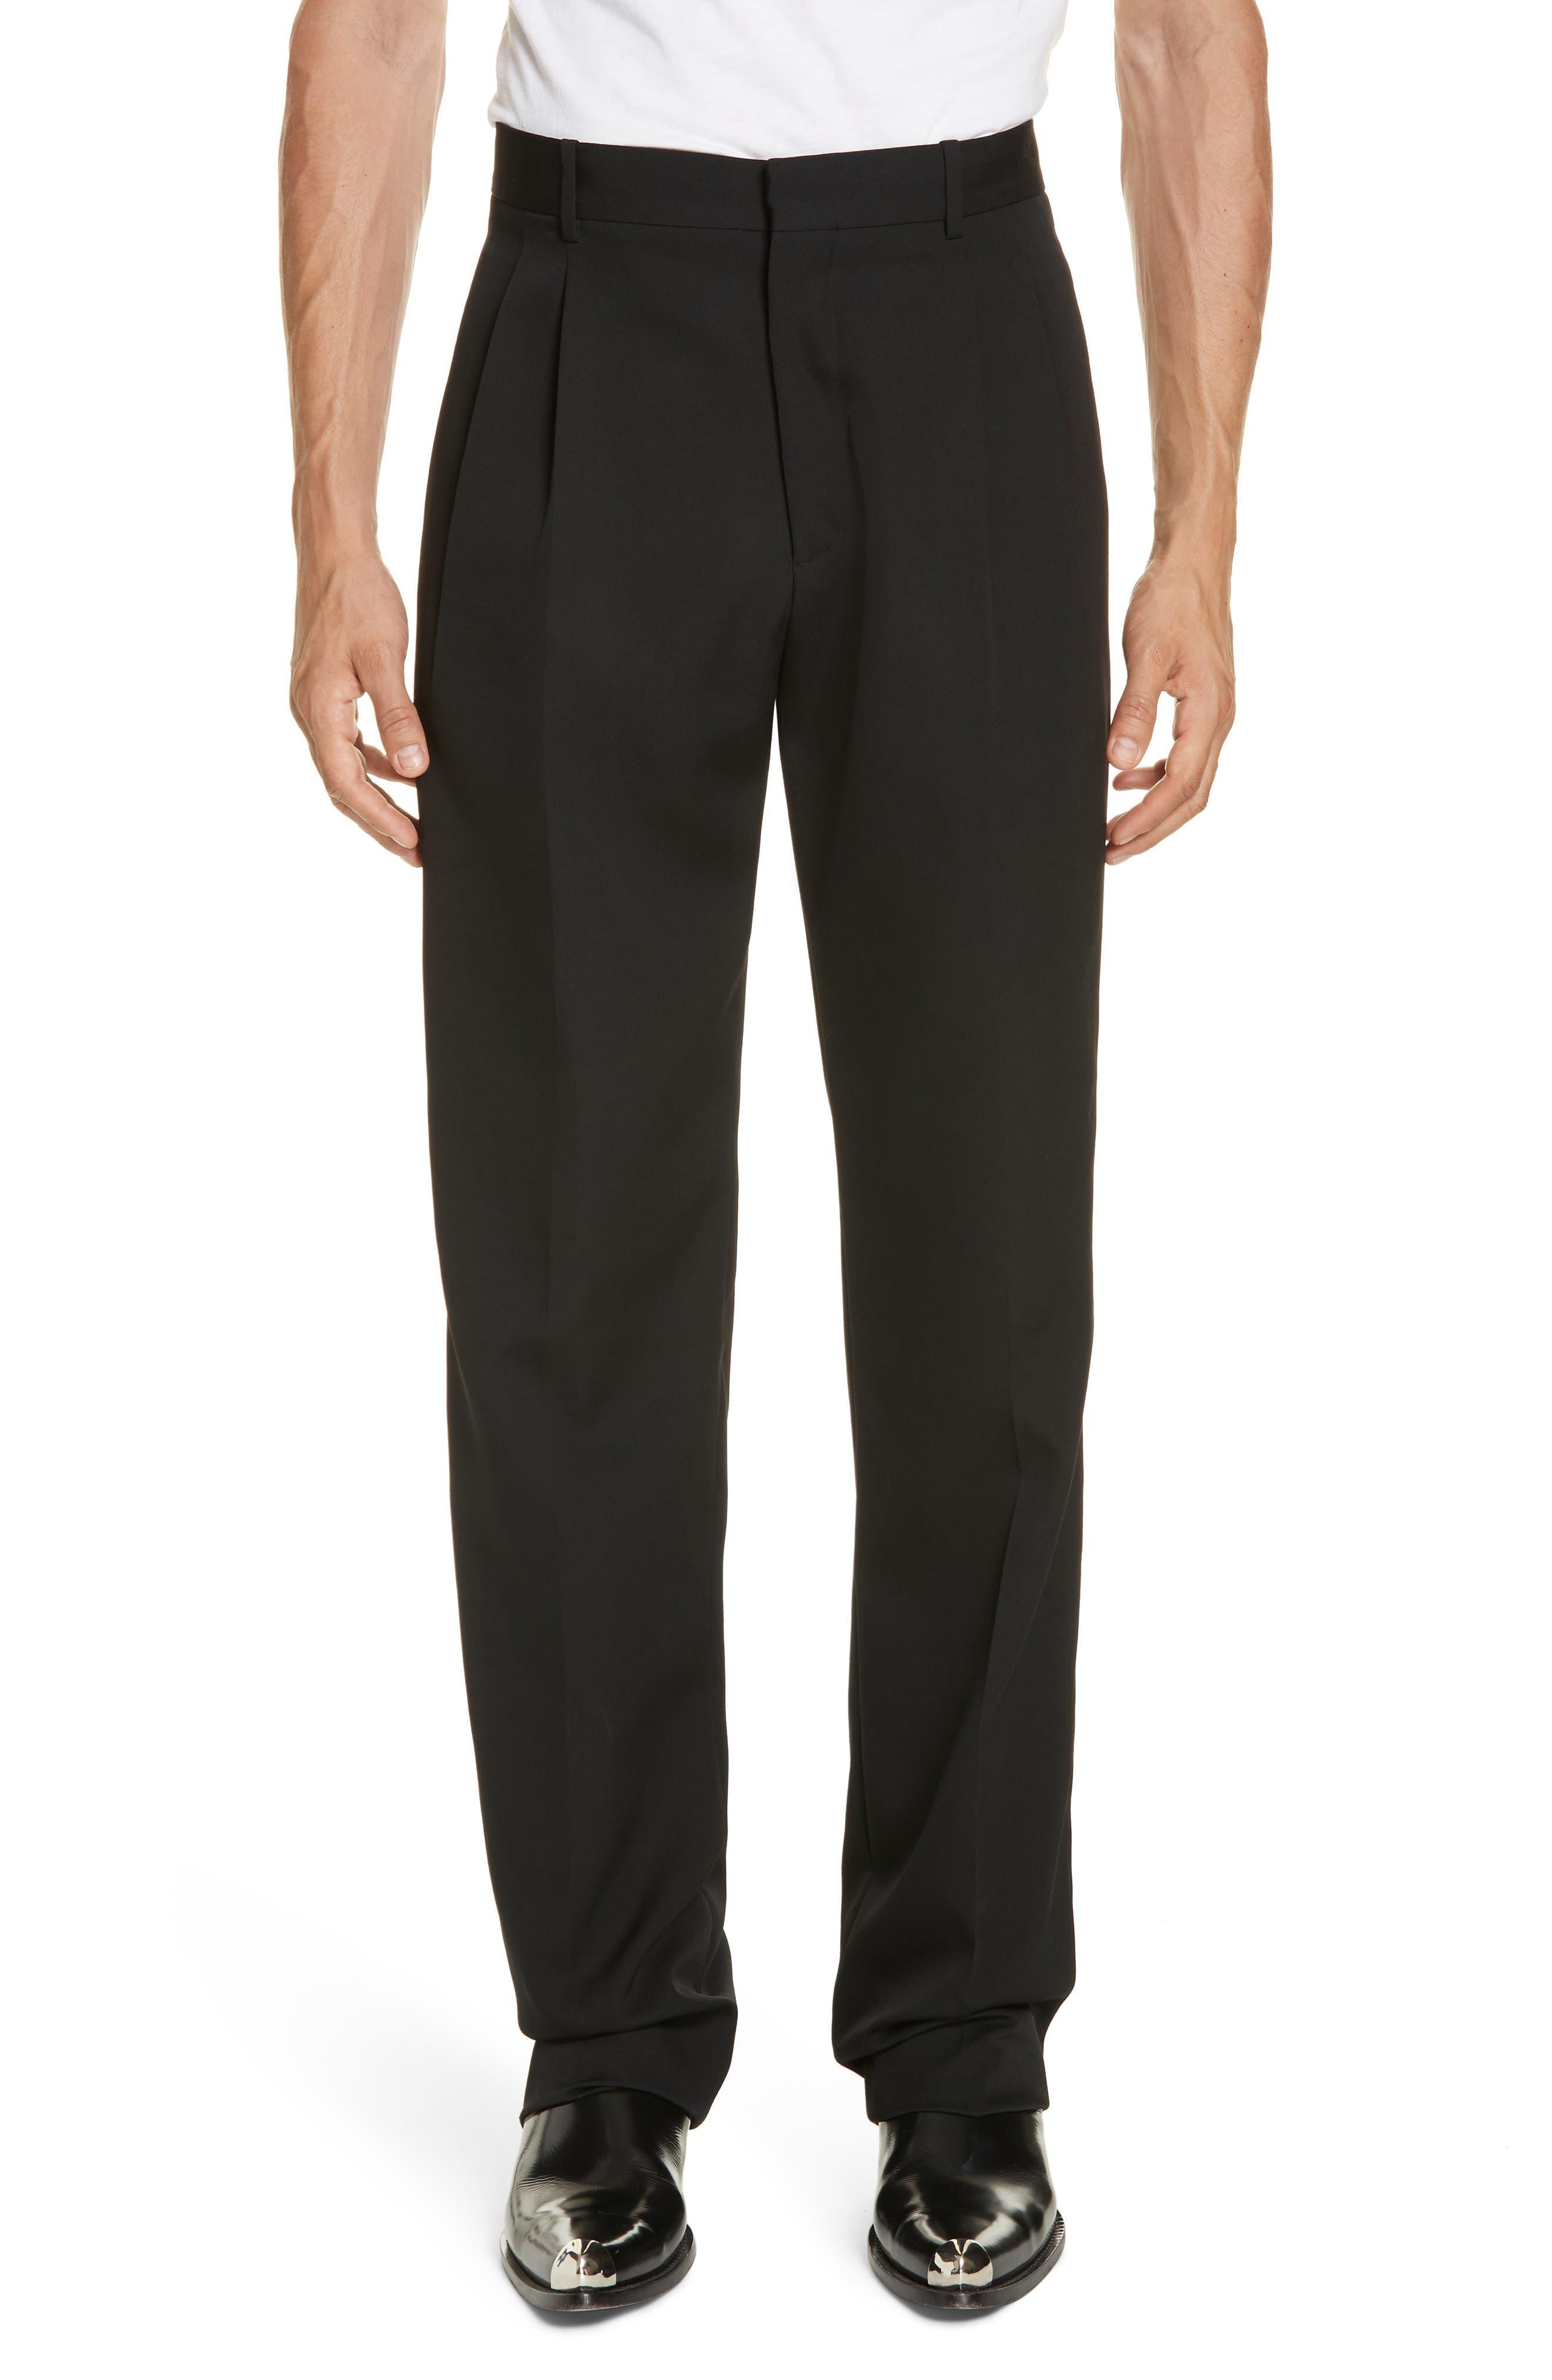 CALVIN KLEIN 205W39NYC, Wool Gabardine Pants, Main thumbnail 1, color, BLACK